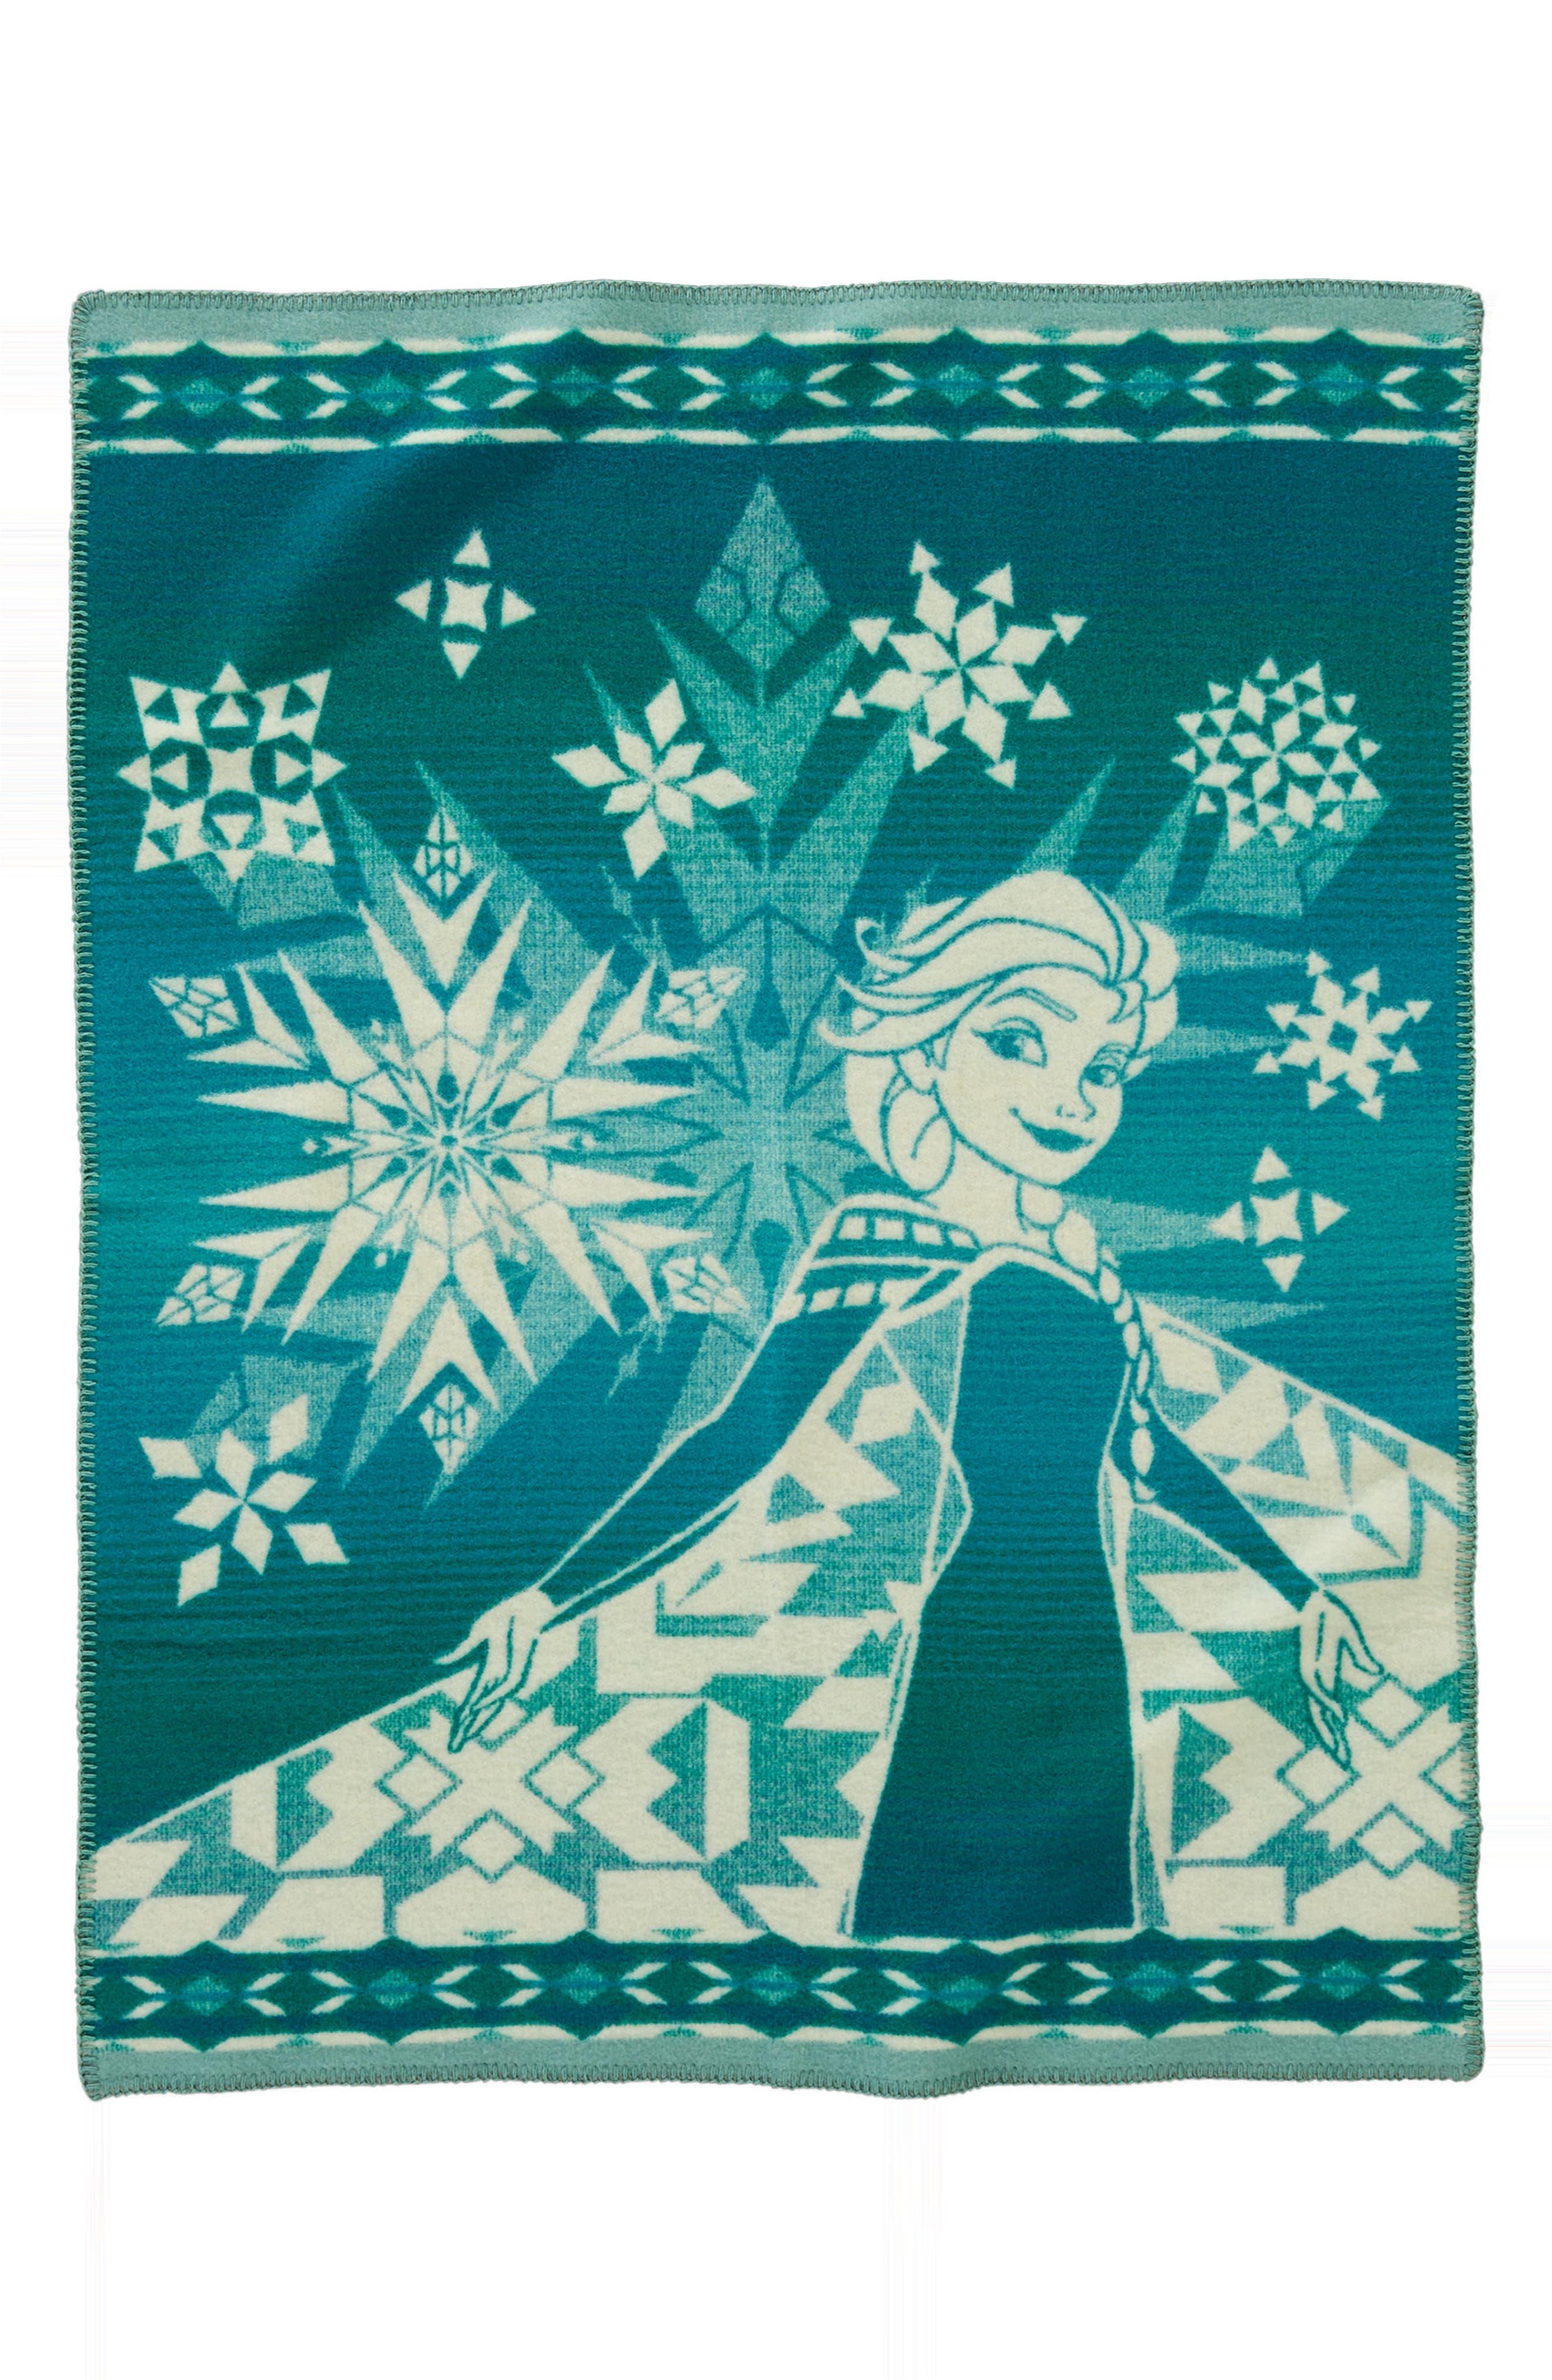 Elsa's Courage Blanket Throw,                             Main thumbnail 1, color,                             Green